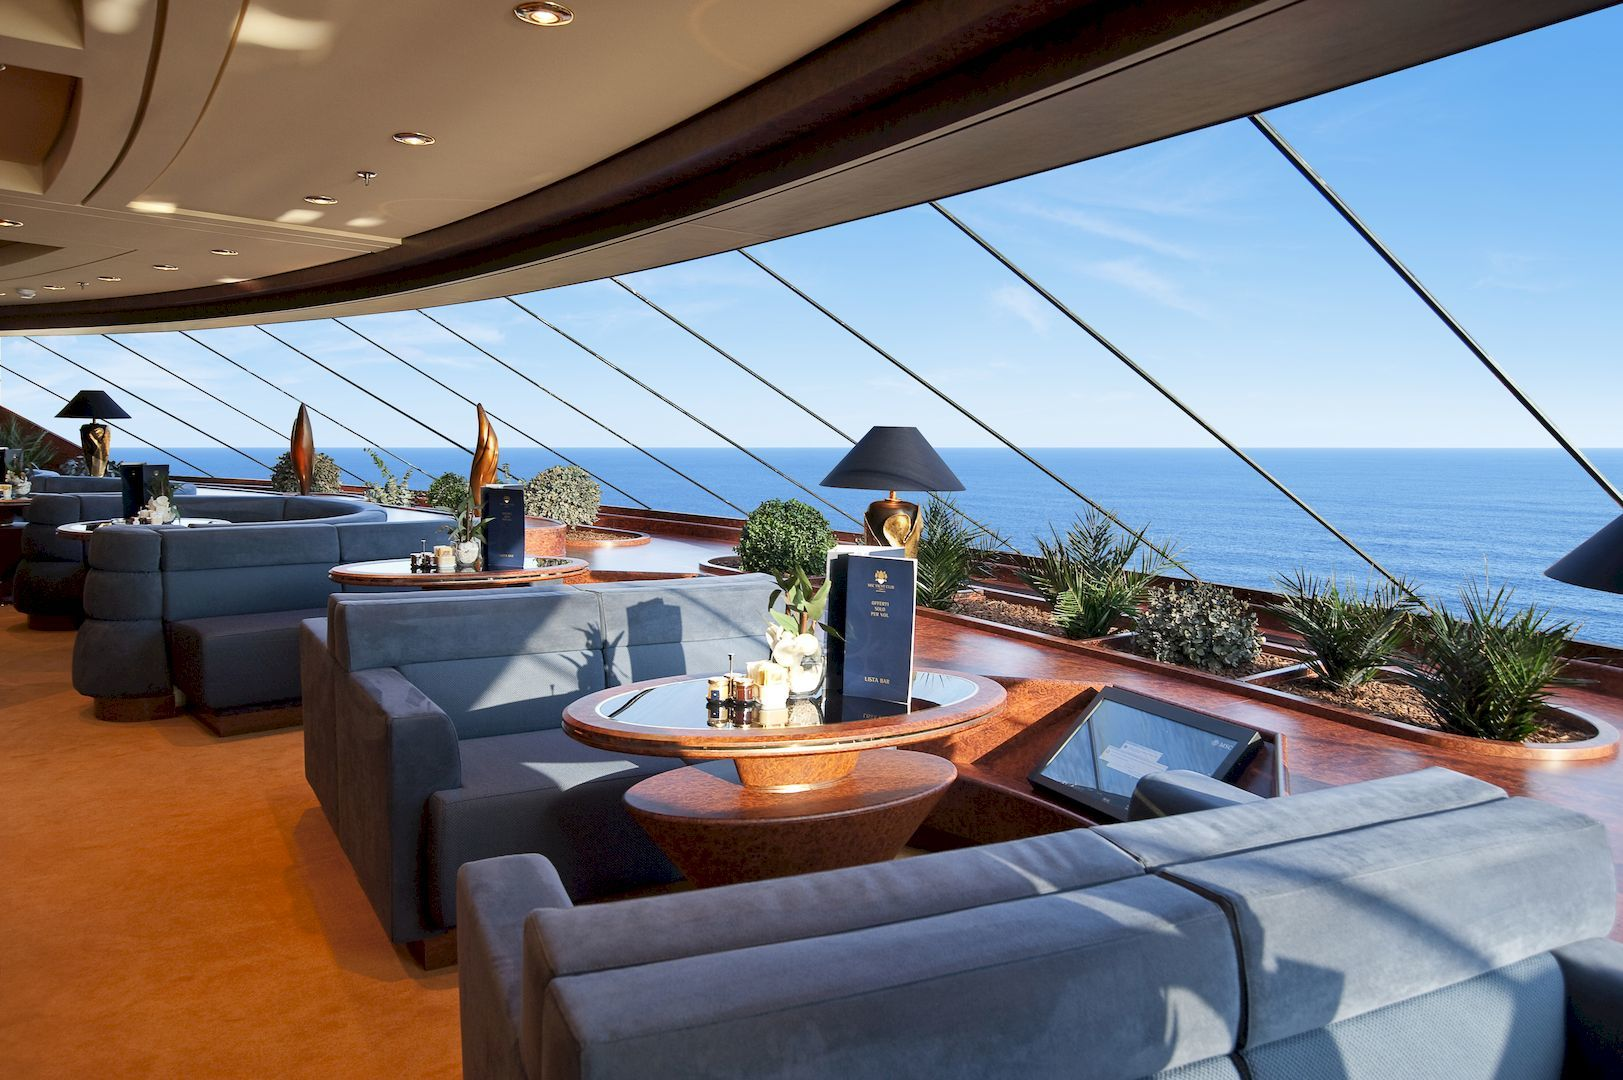 MSC Splendida | Cruiseships | Cruiseway